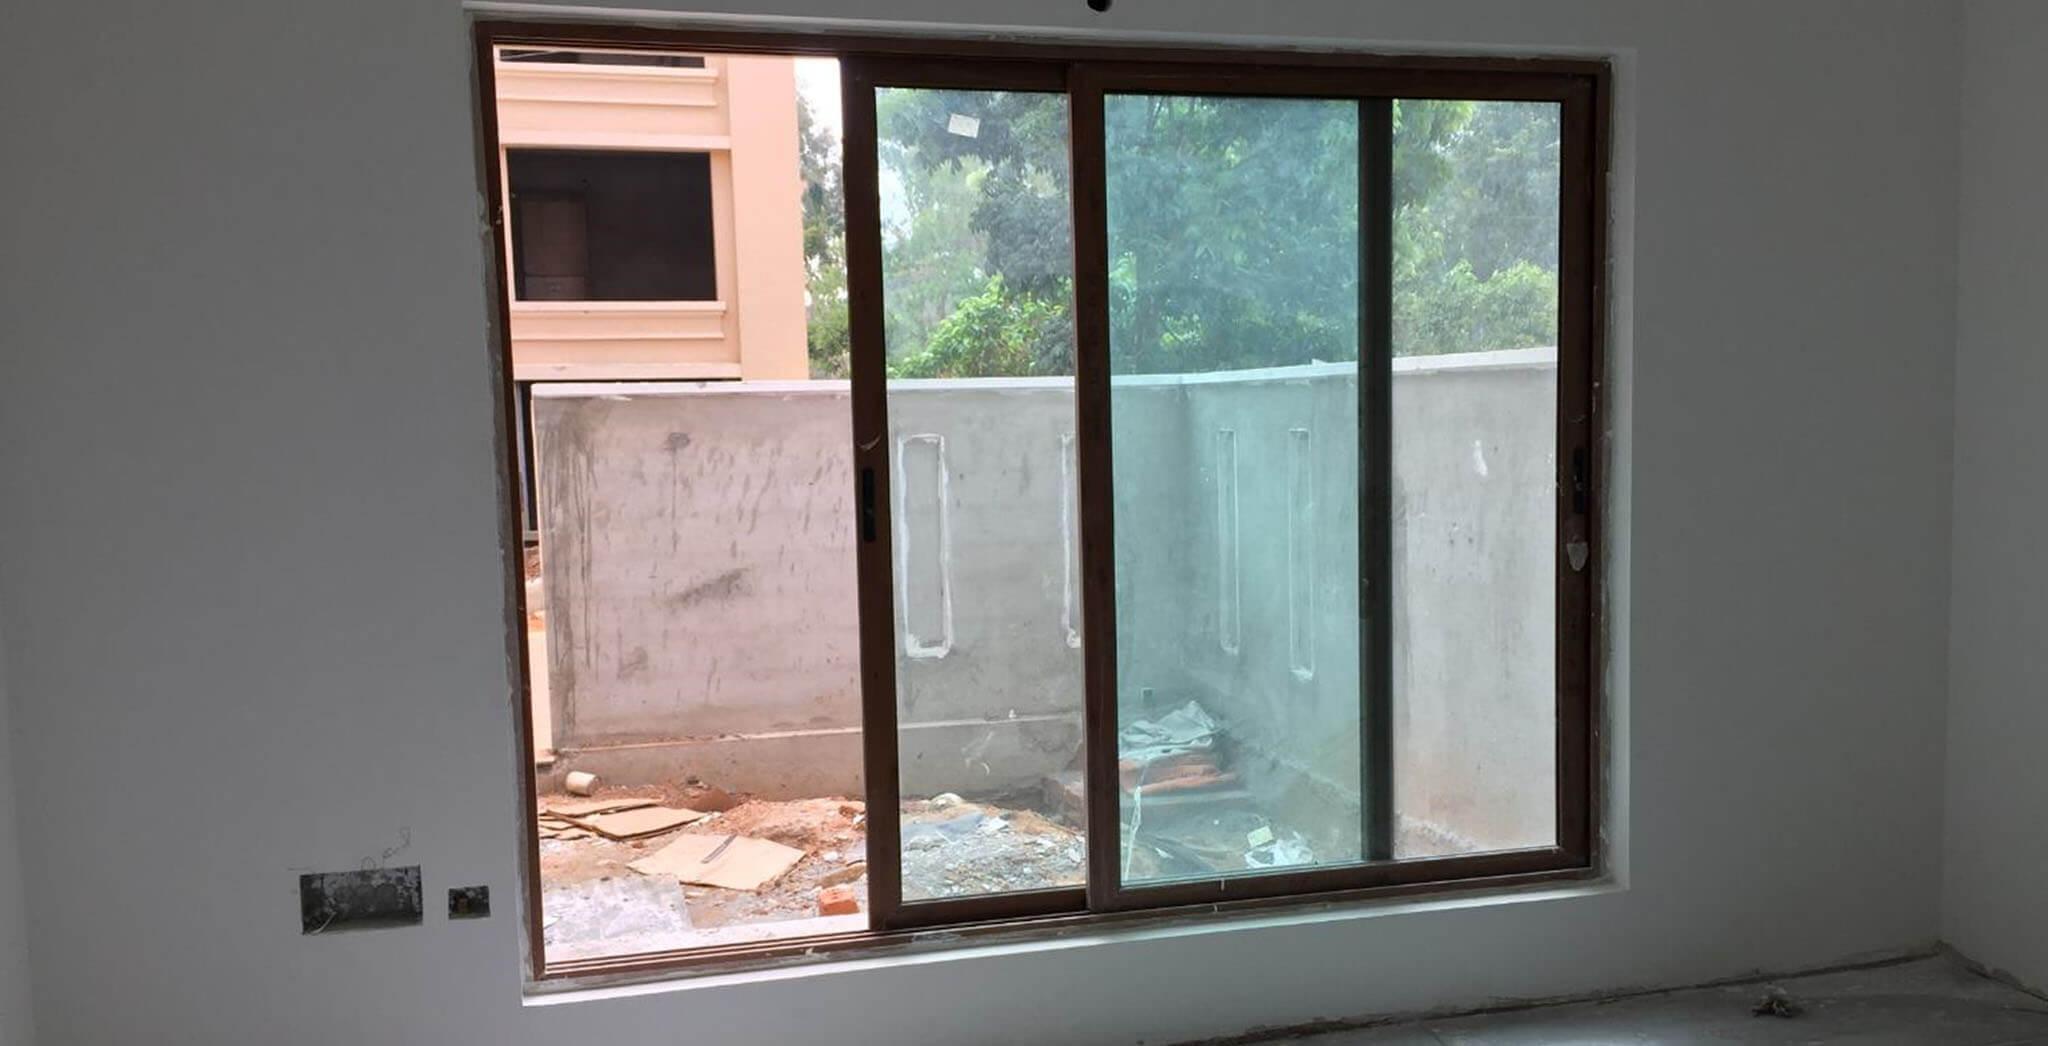 Jan 2019 - Villas window installation work-in-progress